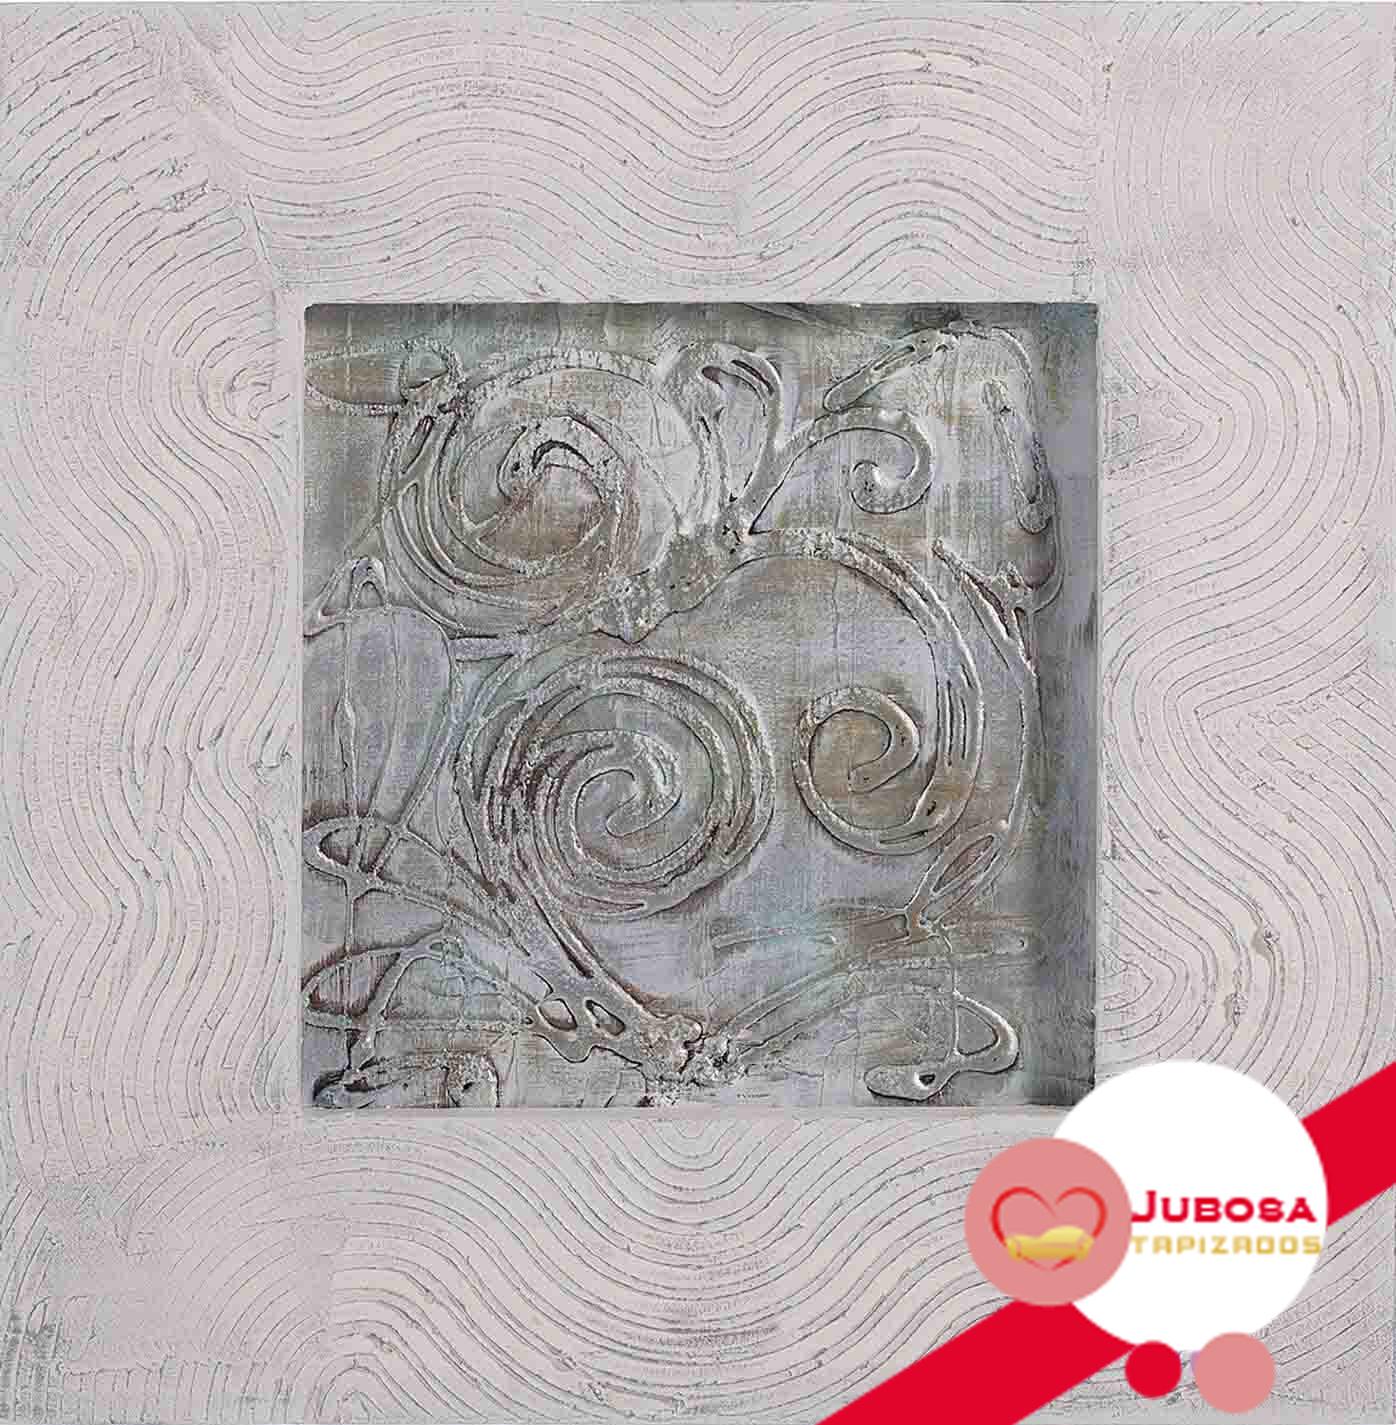 cuadro espiral tapizados jubosa